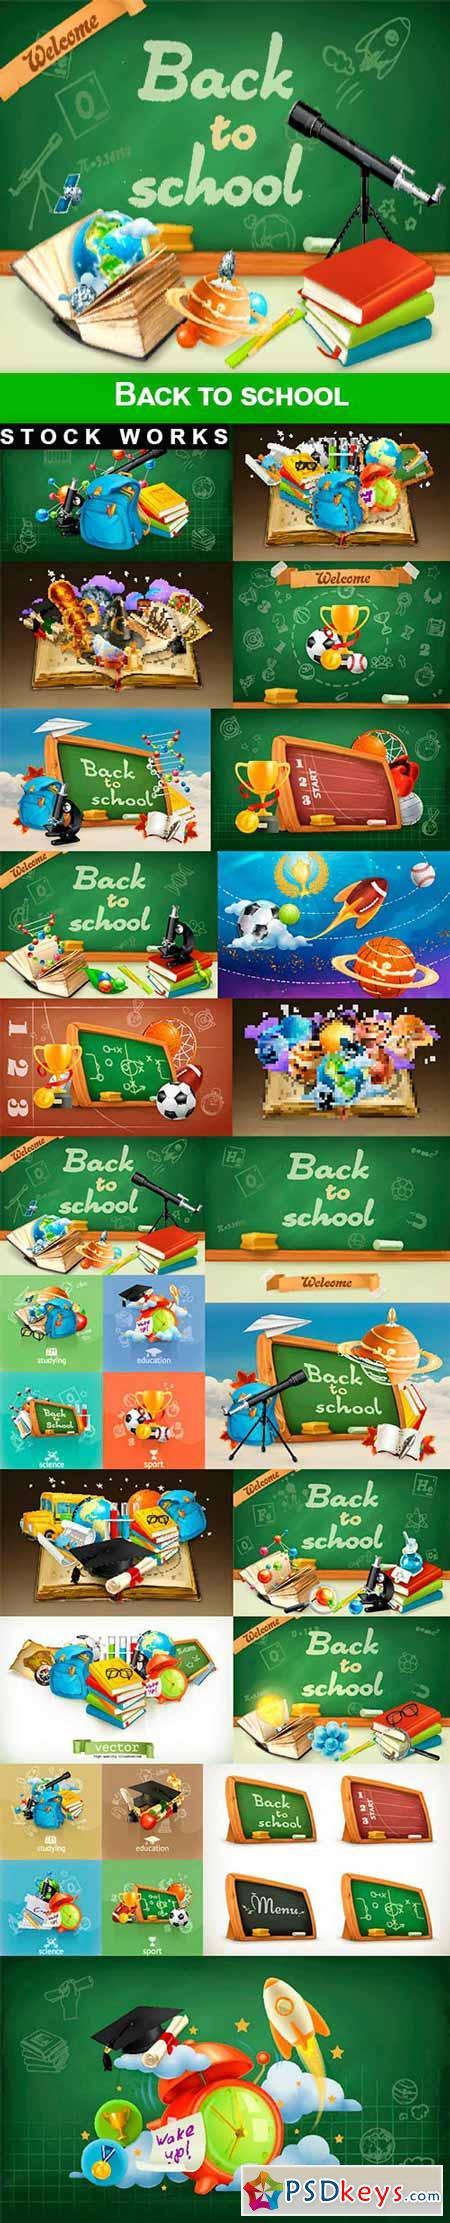 Back to school - 21 EPS